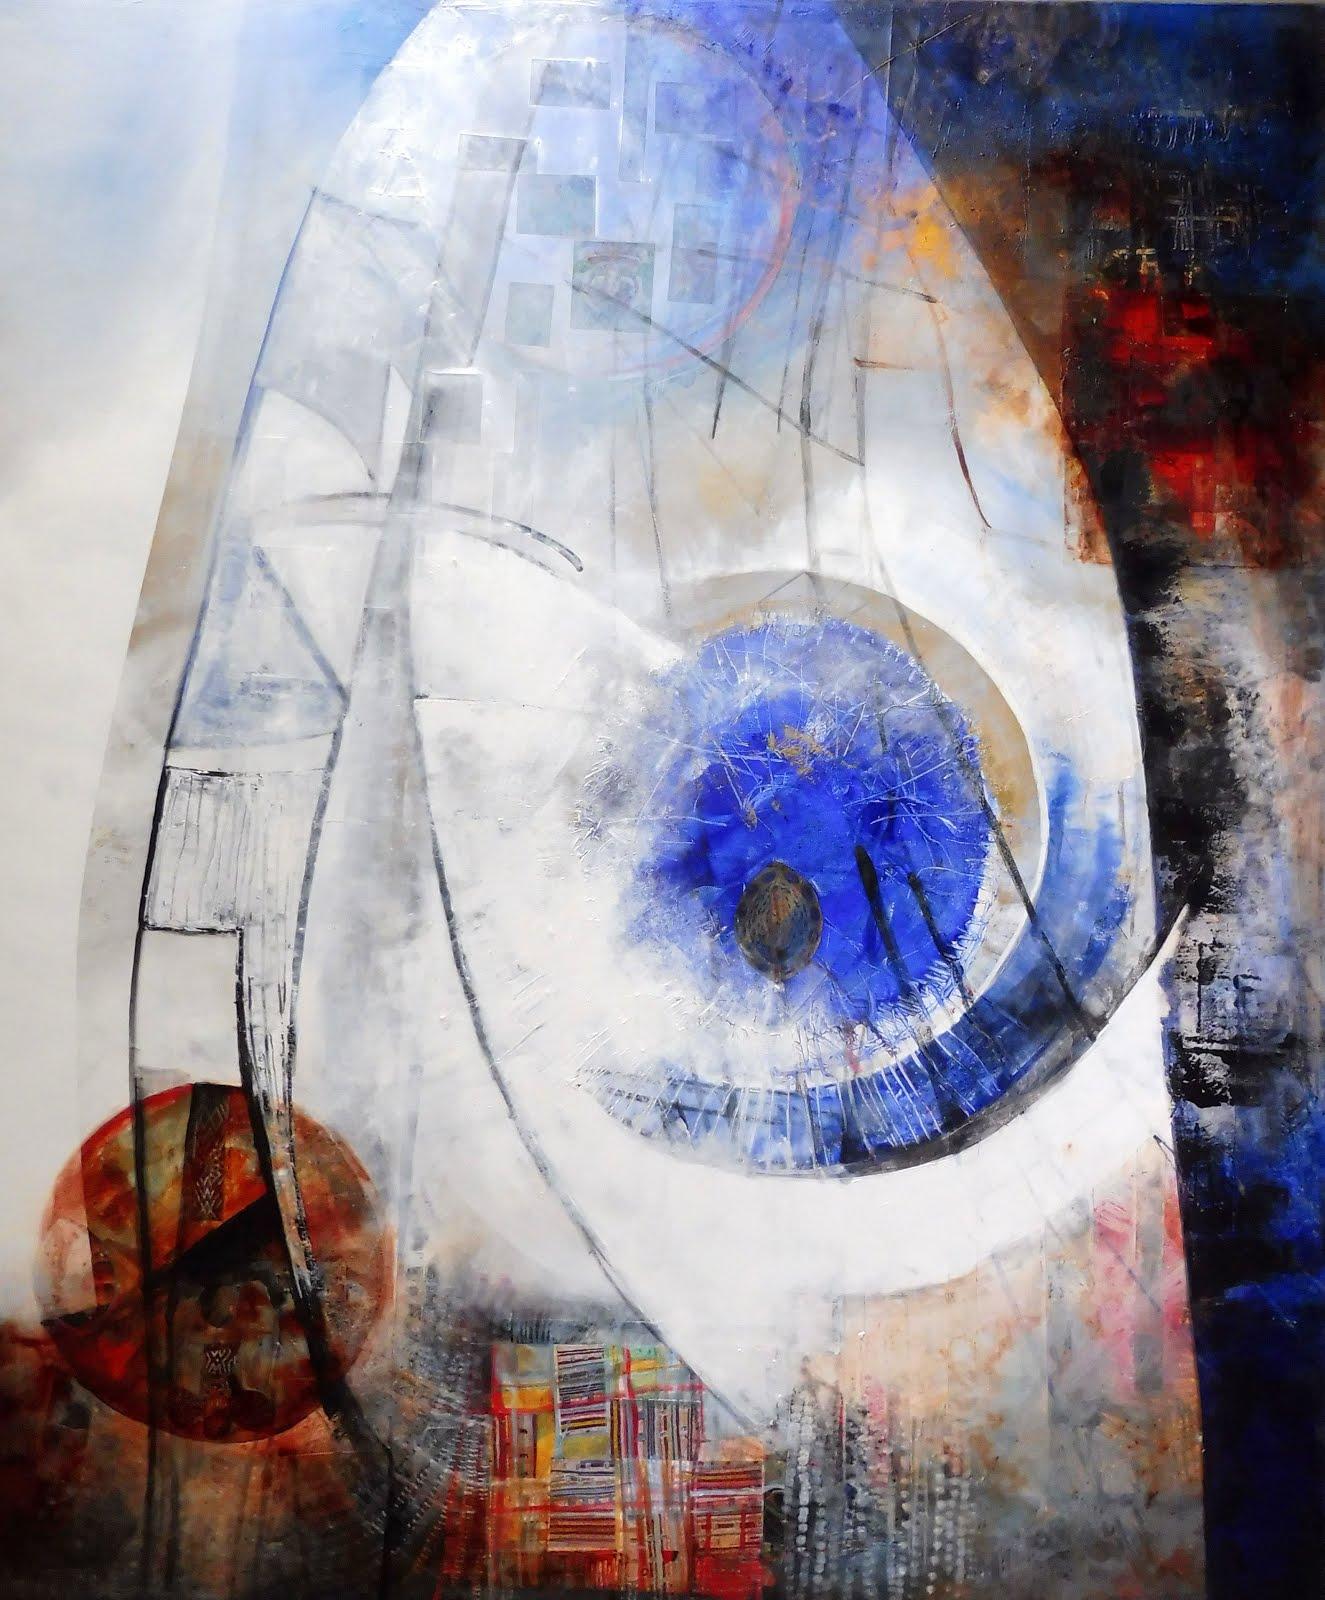 Blue eye - 100 x 120 cm - 2017